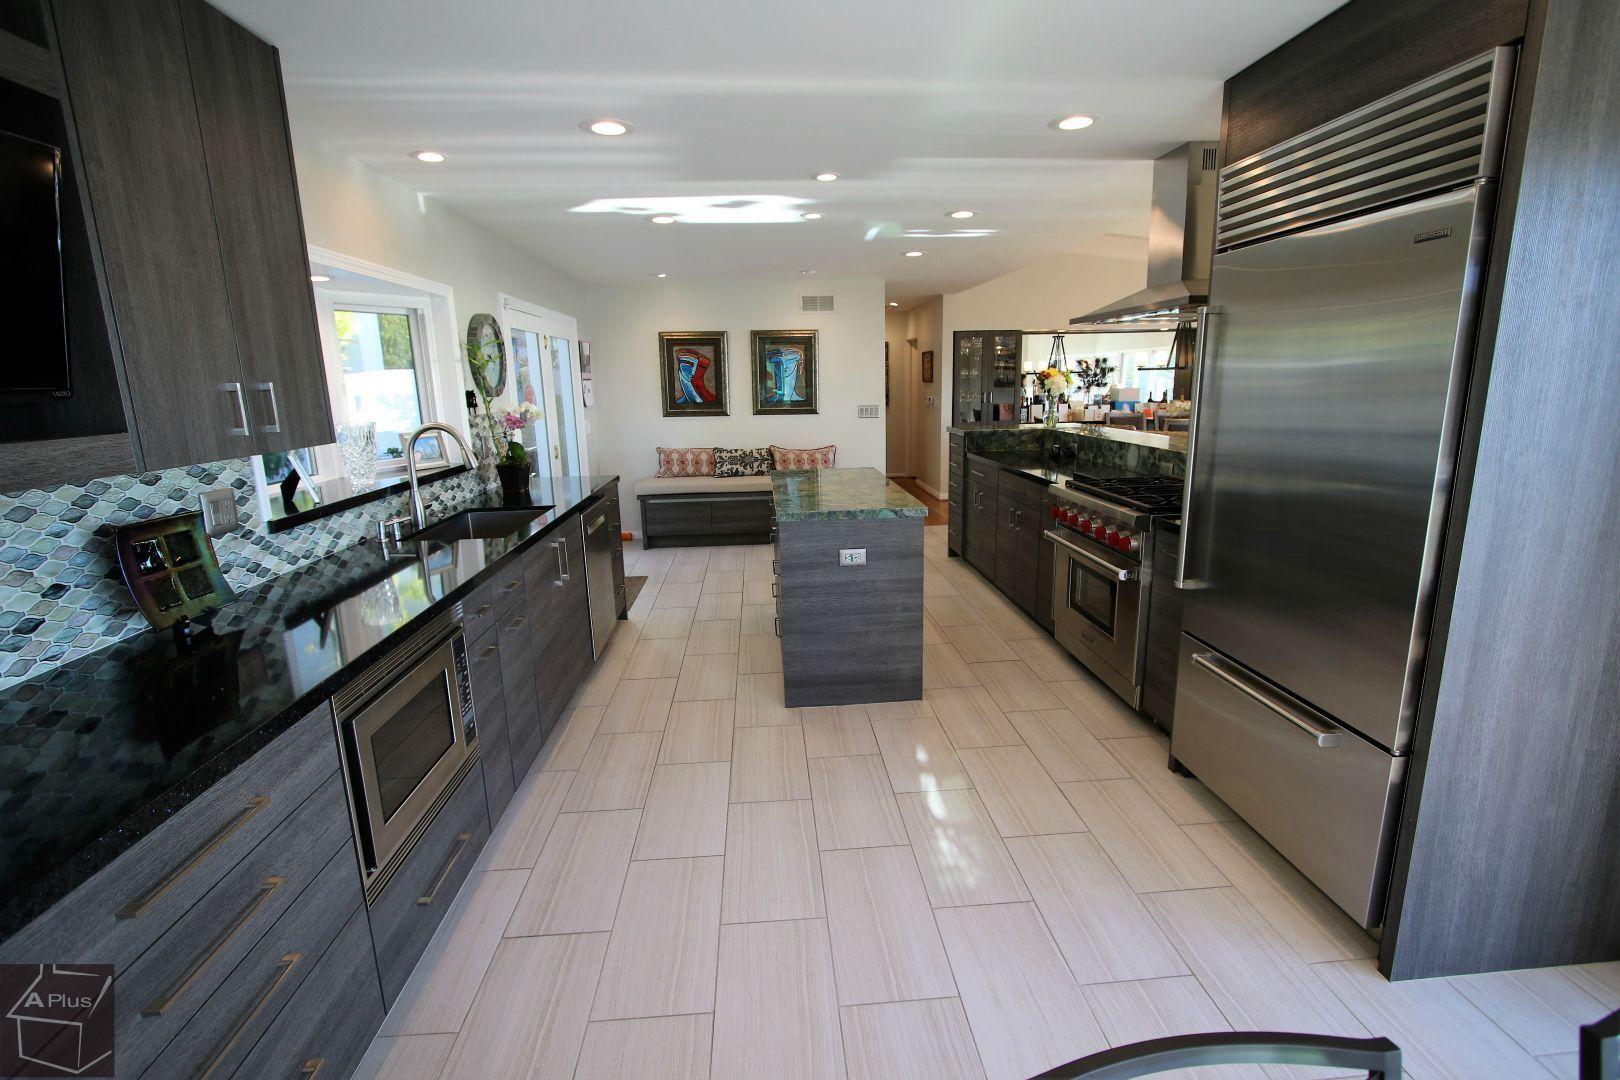 Kitchen Designer Orange County Stunning Design Build Contemporary Modern #kitchenremodel With Sophia Line Inspiration Design